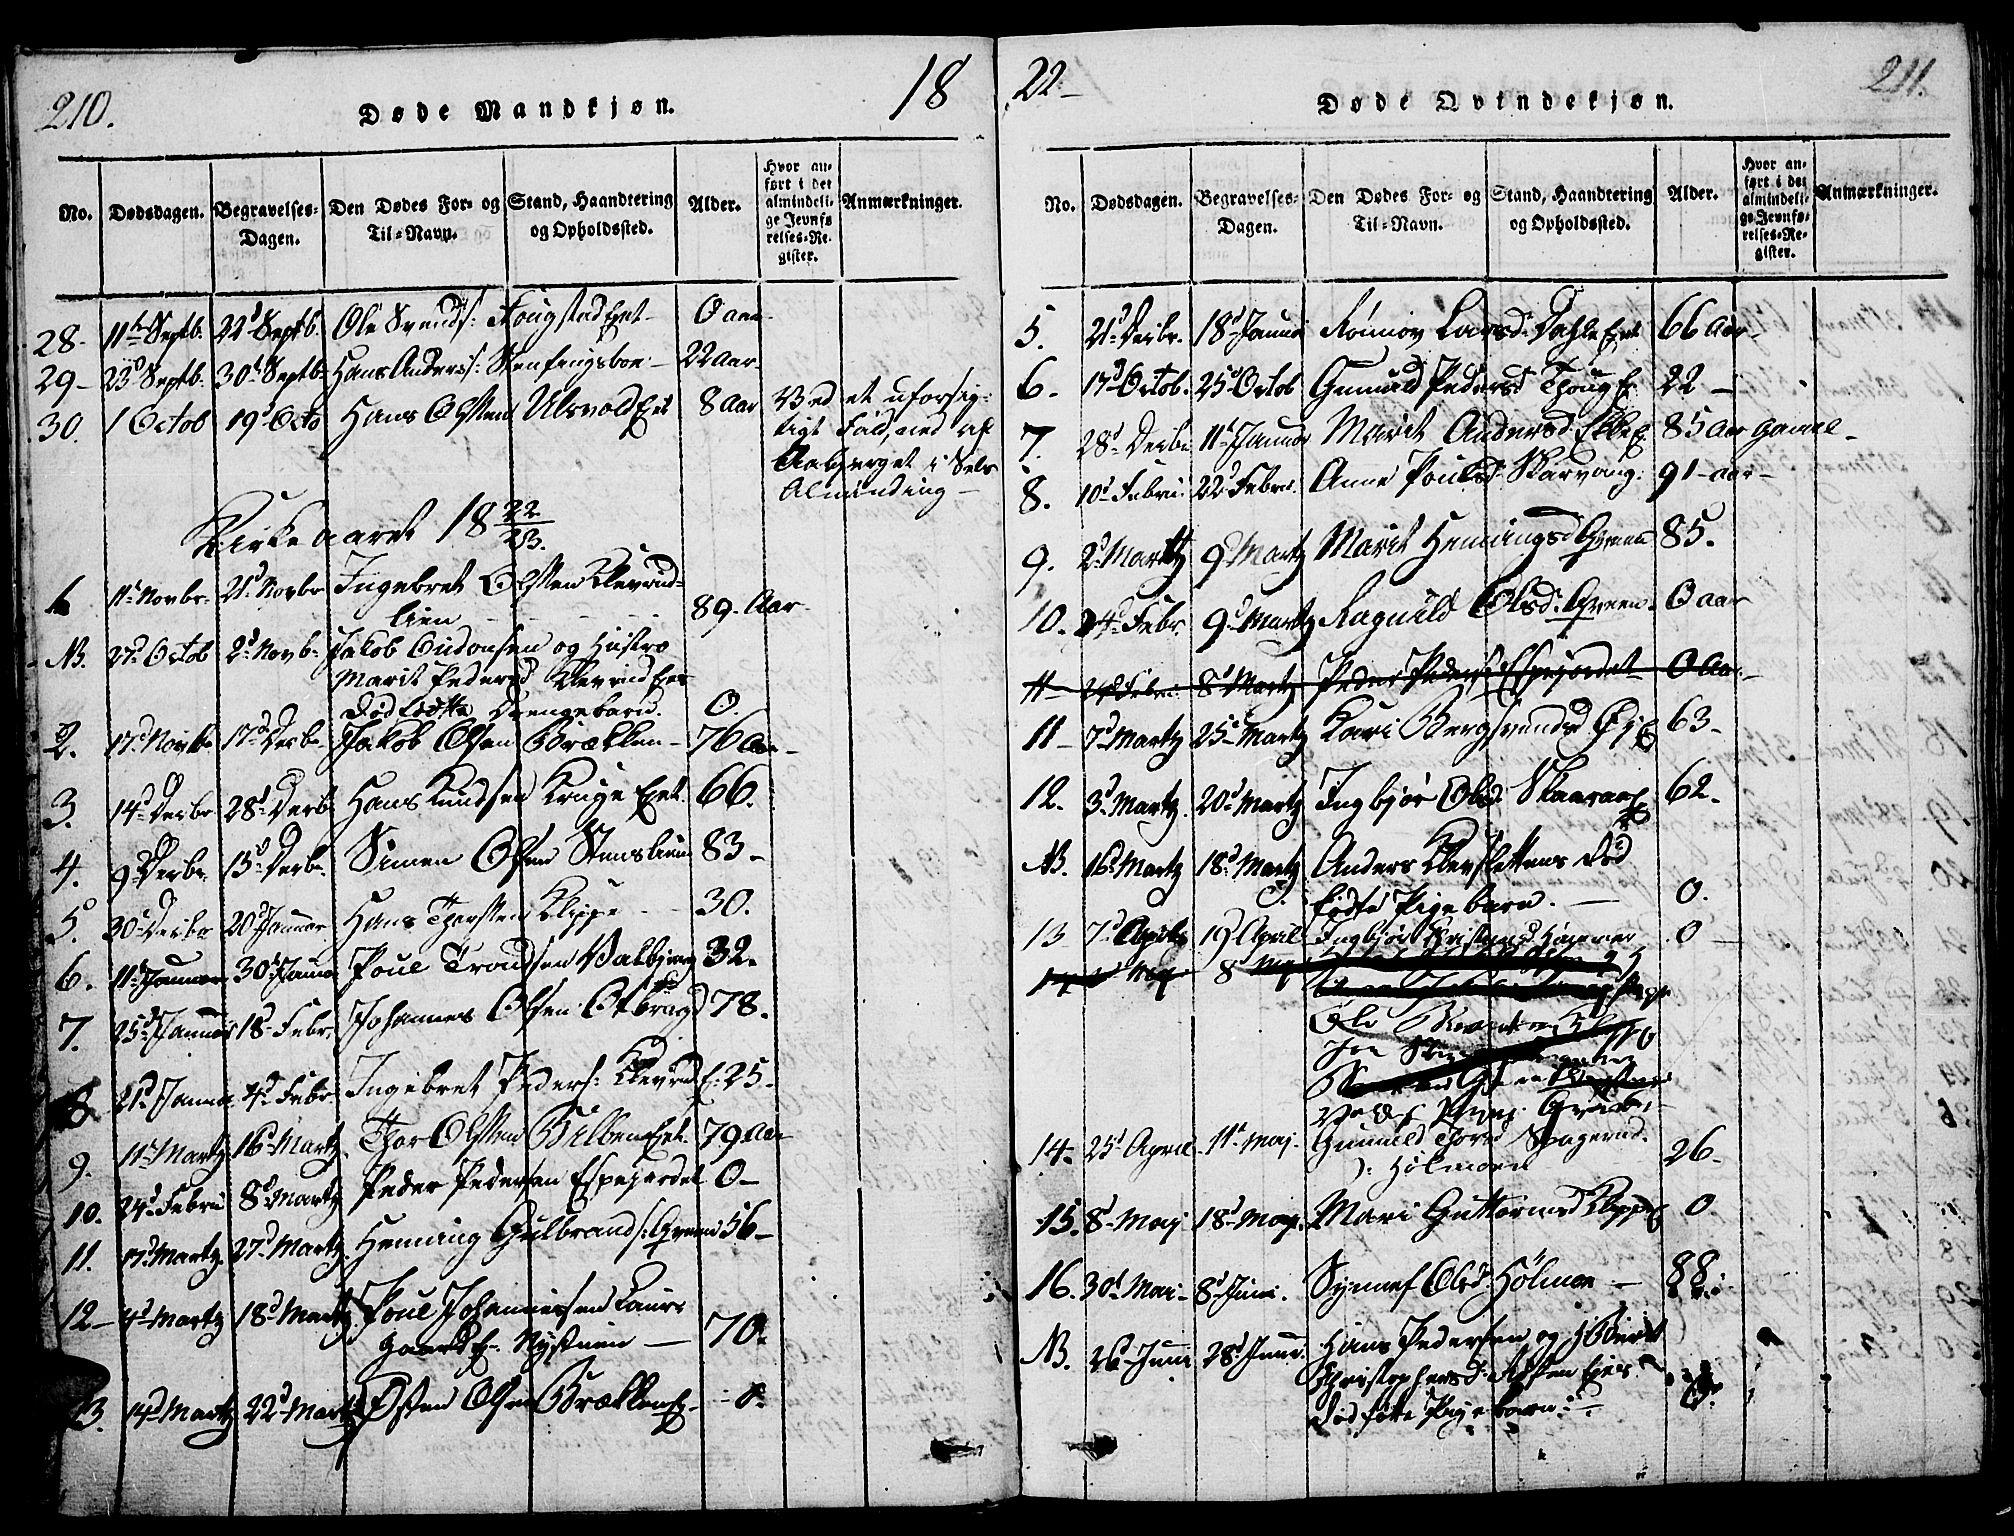 SAH, Vågå prestekontor, Ministerialbok nr. 3, 1815-1827, s. 210-211